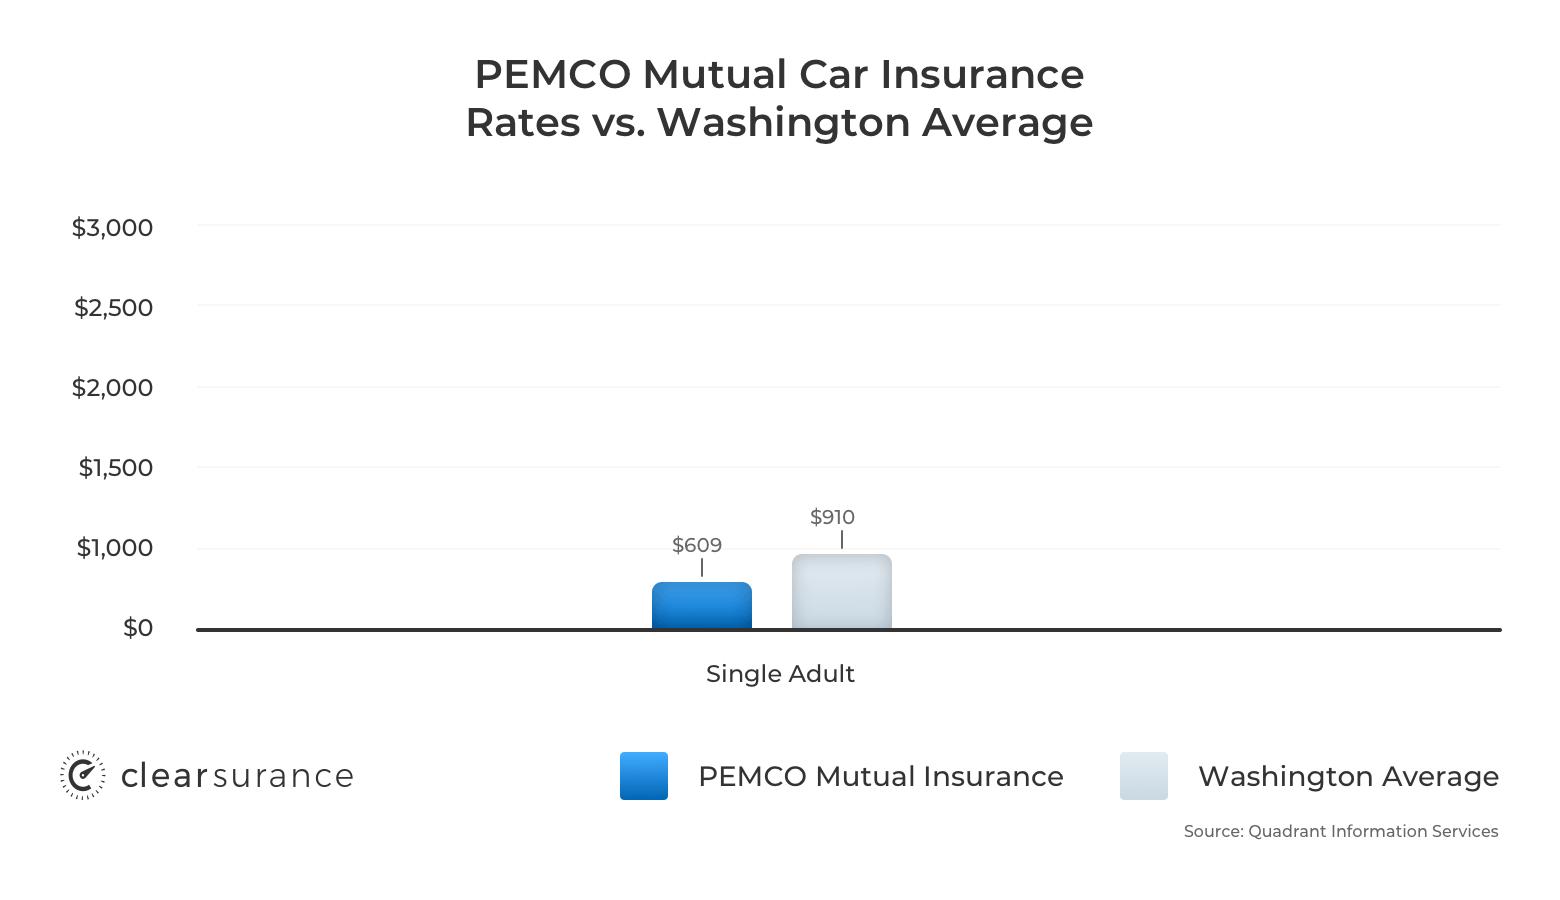 PEMCO car insurance rates